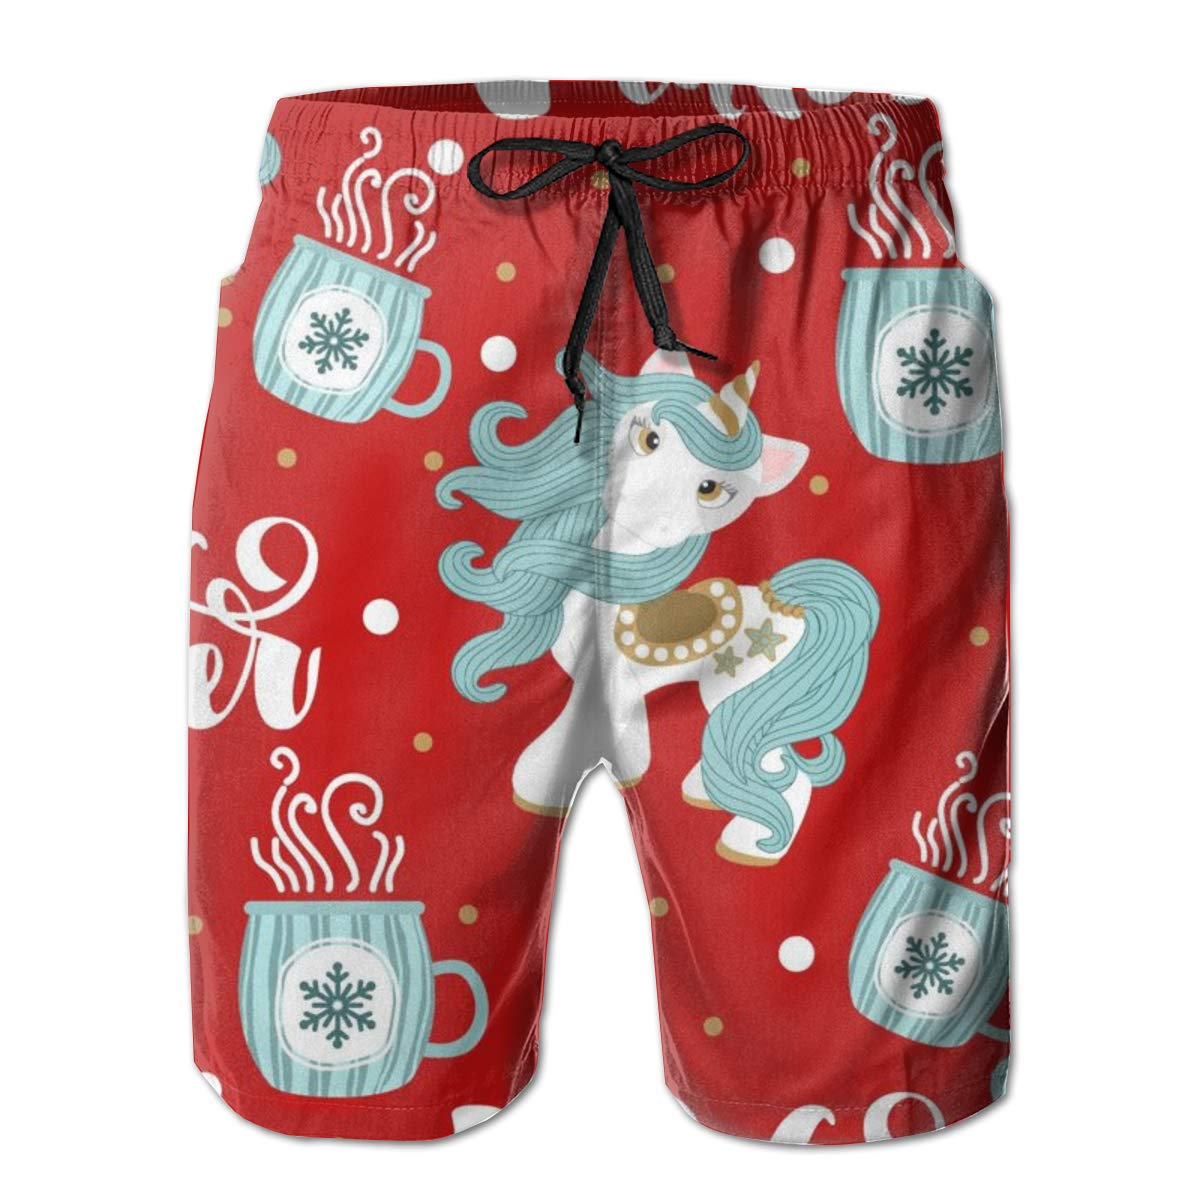 Christmas Unicorn and Festive Print Swim Trunks Summer Beach Shorts Pockets Boardshorts for Men